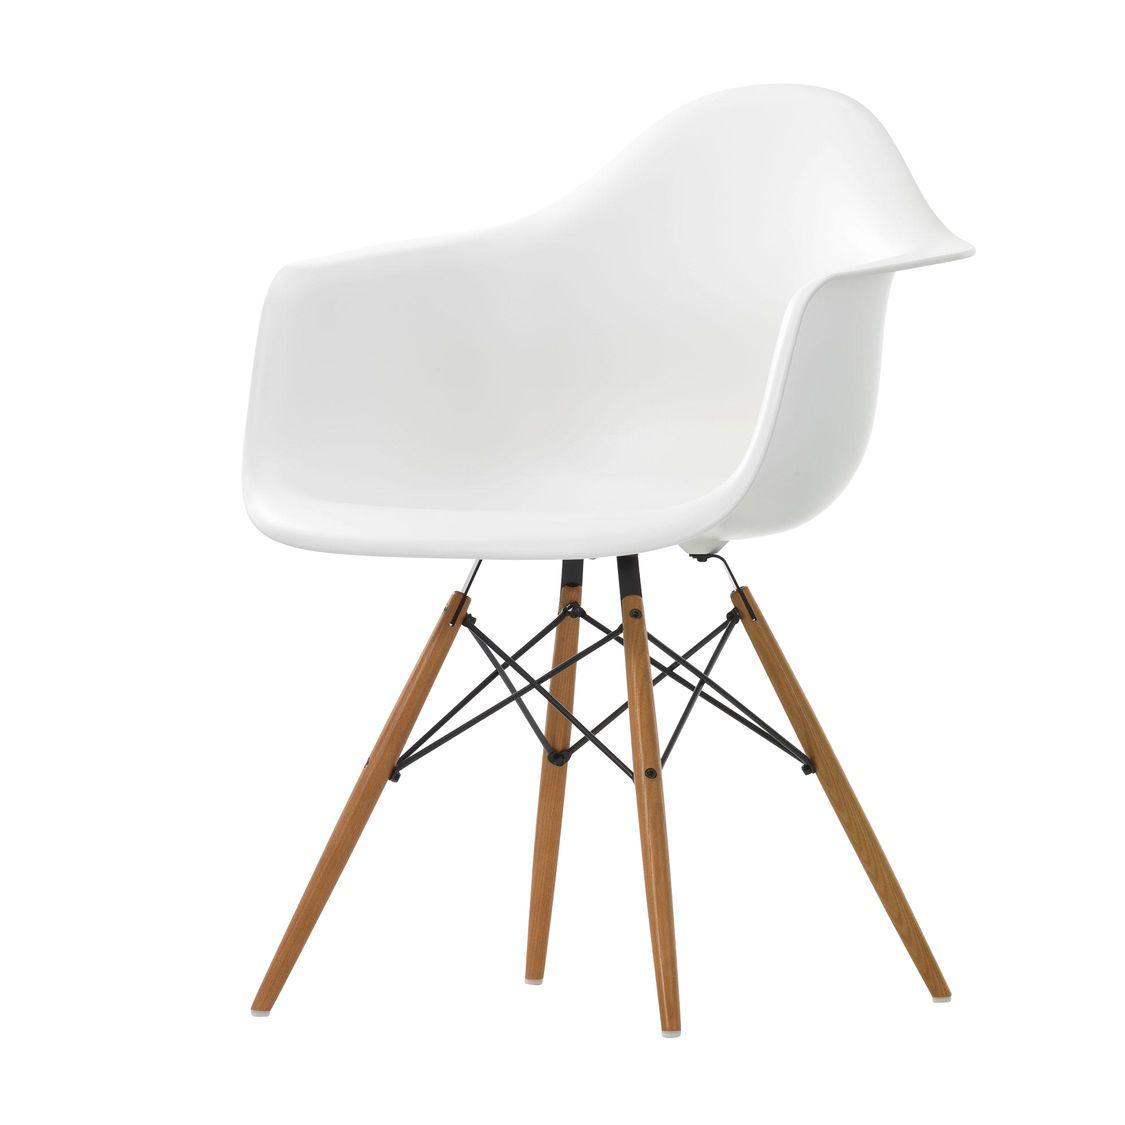 Eames plastic armchair daw armlehnstuhl esche vitra for Pool rund stahl